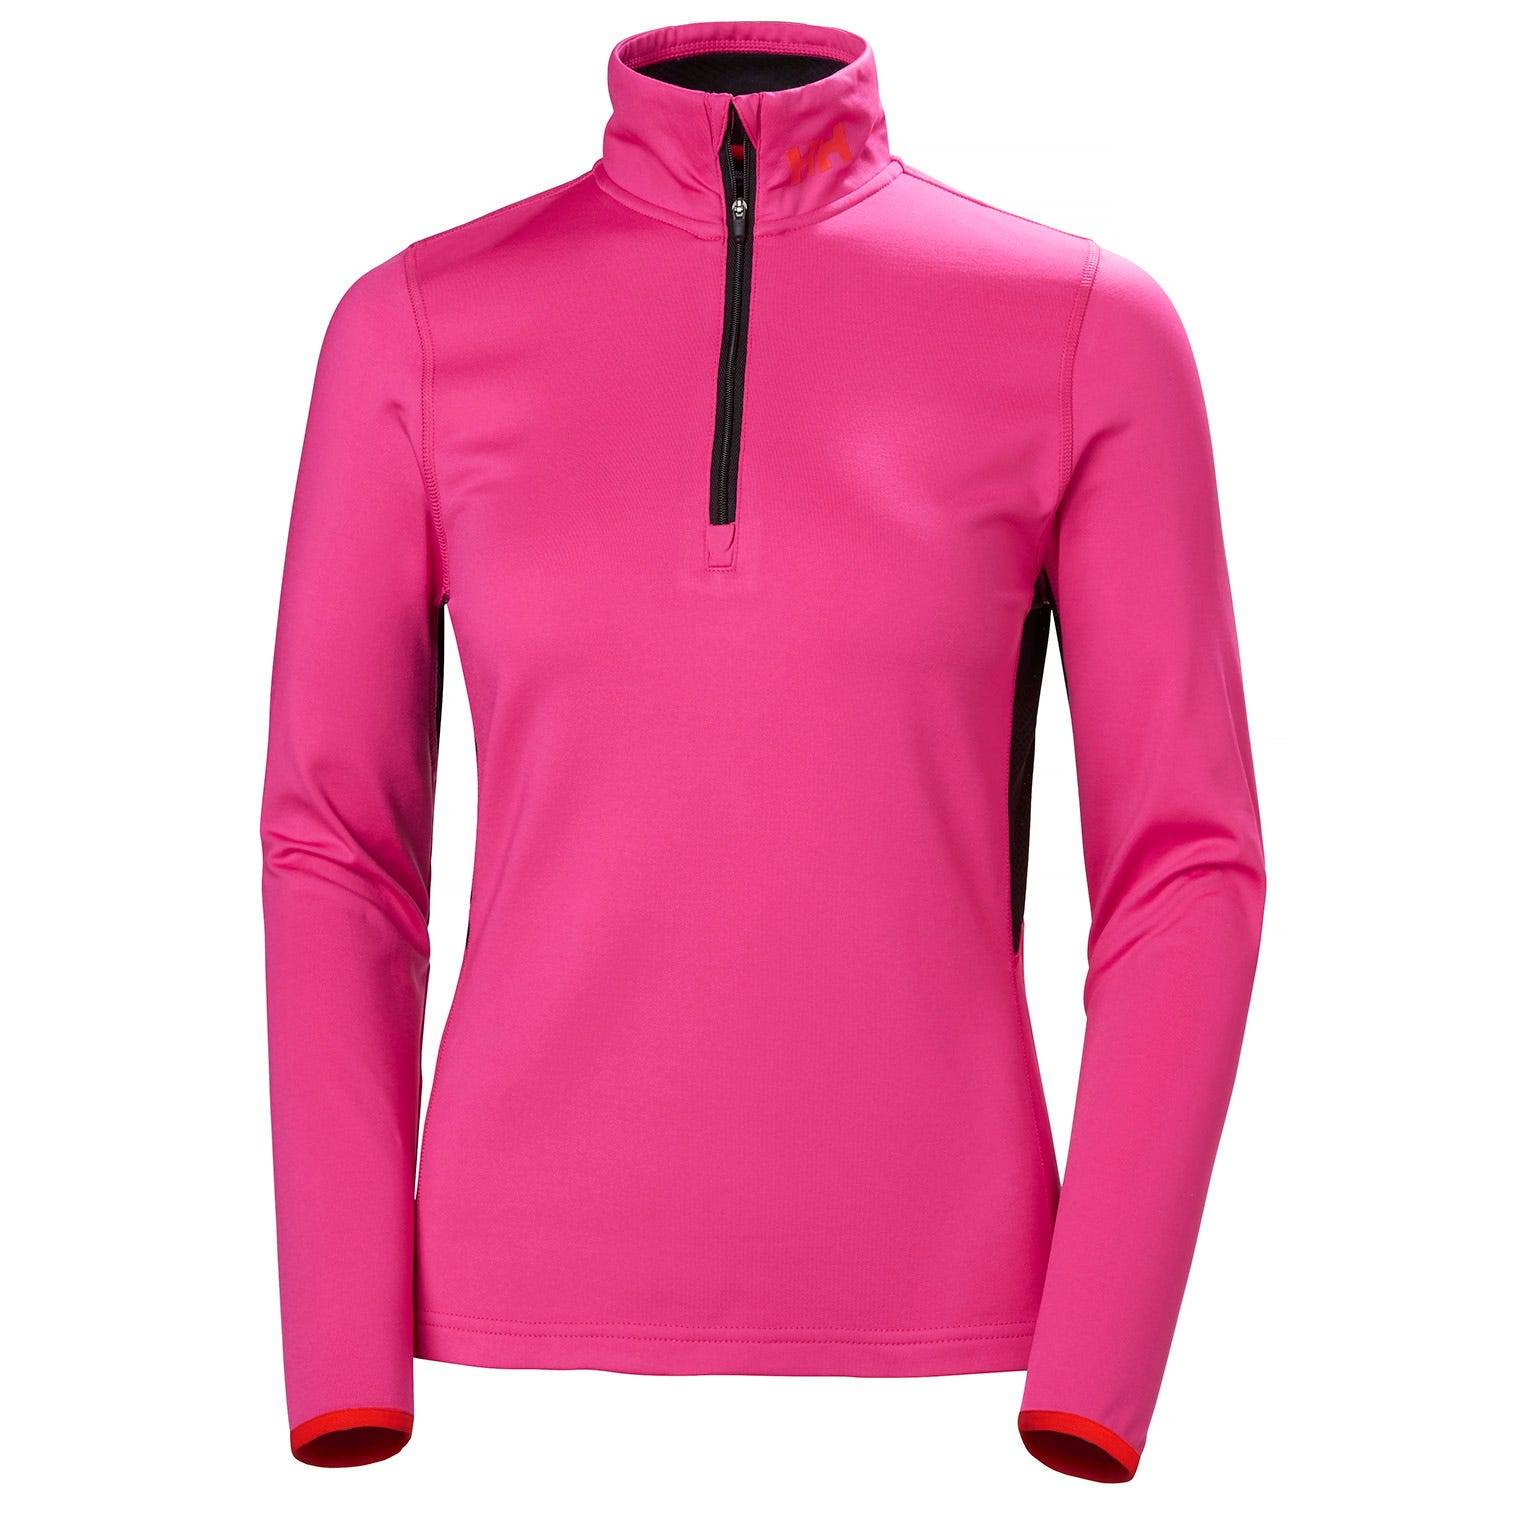 Helly Hansen W Phantom Mesh 1/2 Zip Midlayer Womens Fleece Pink XL